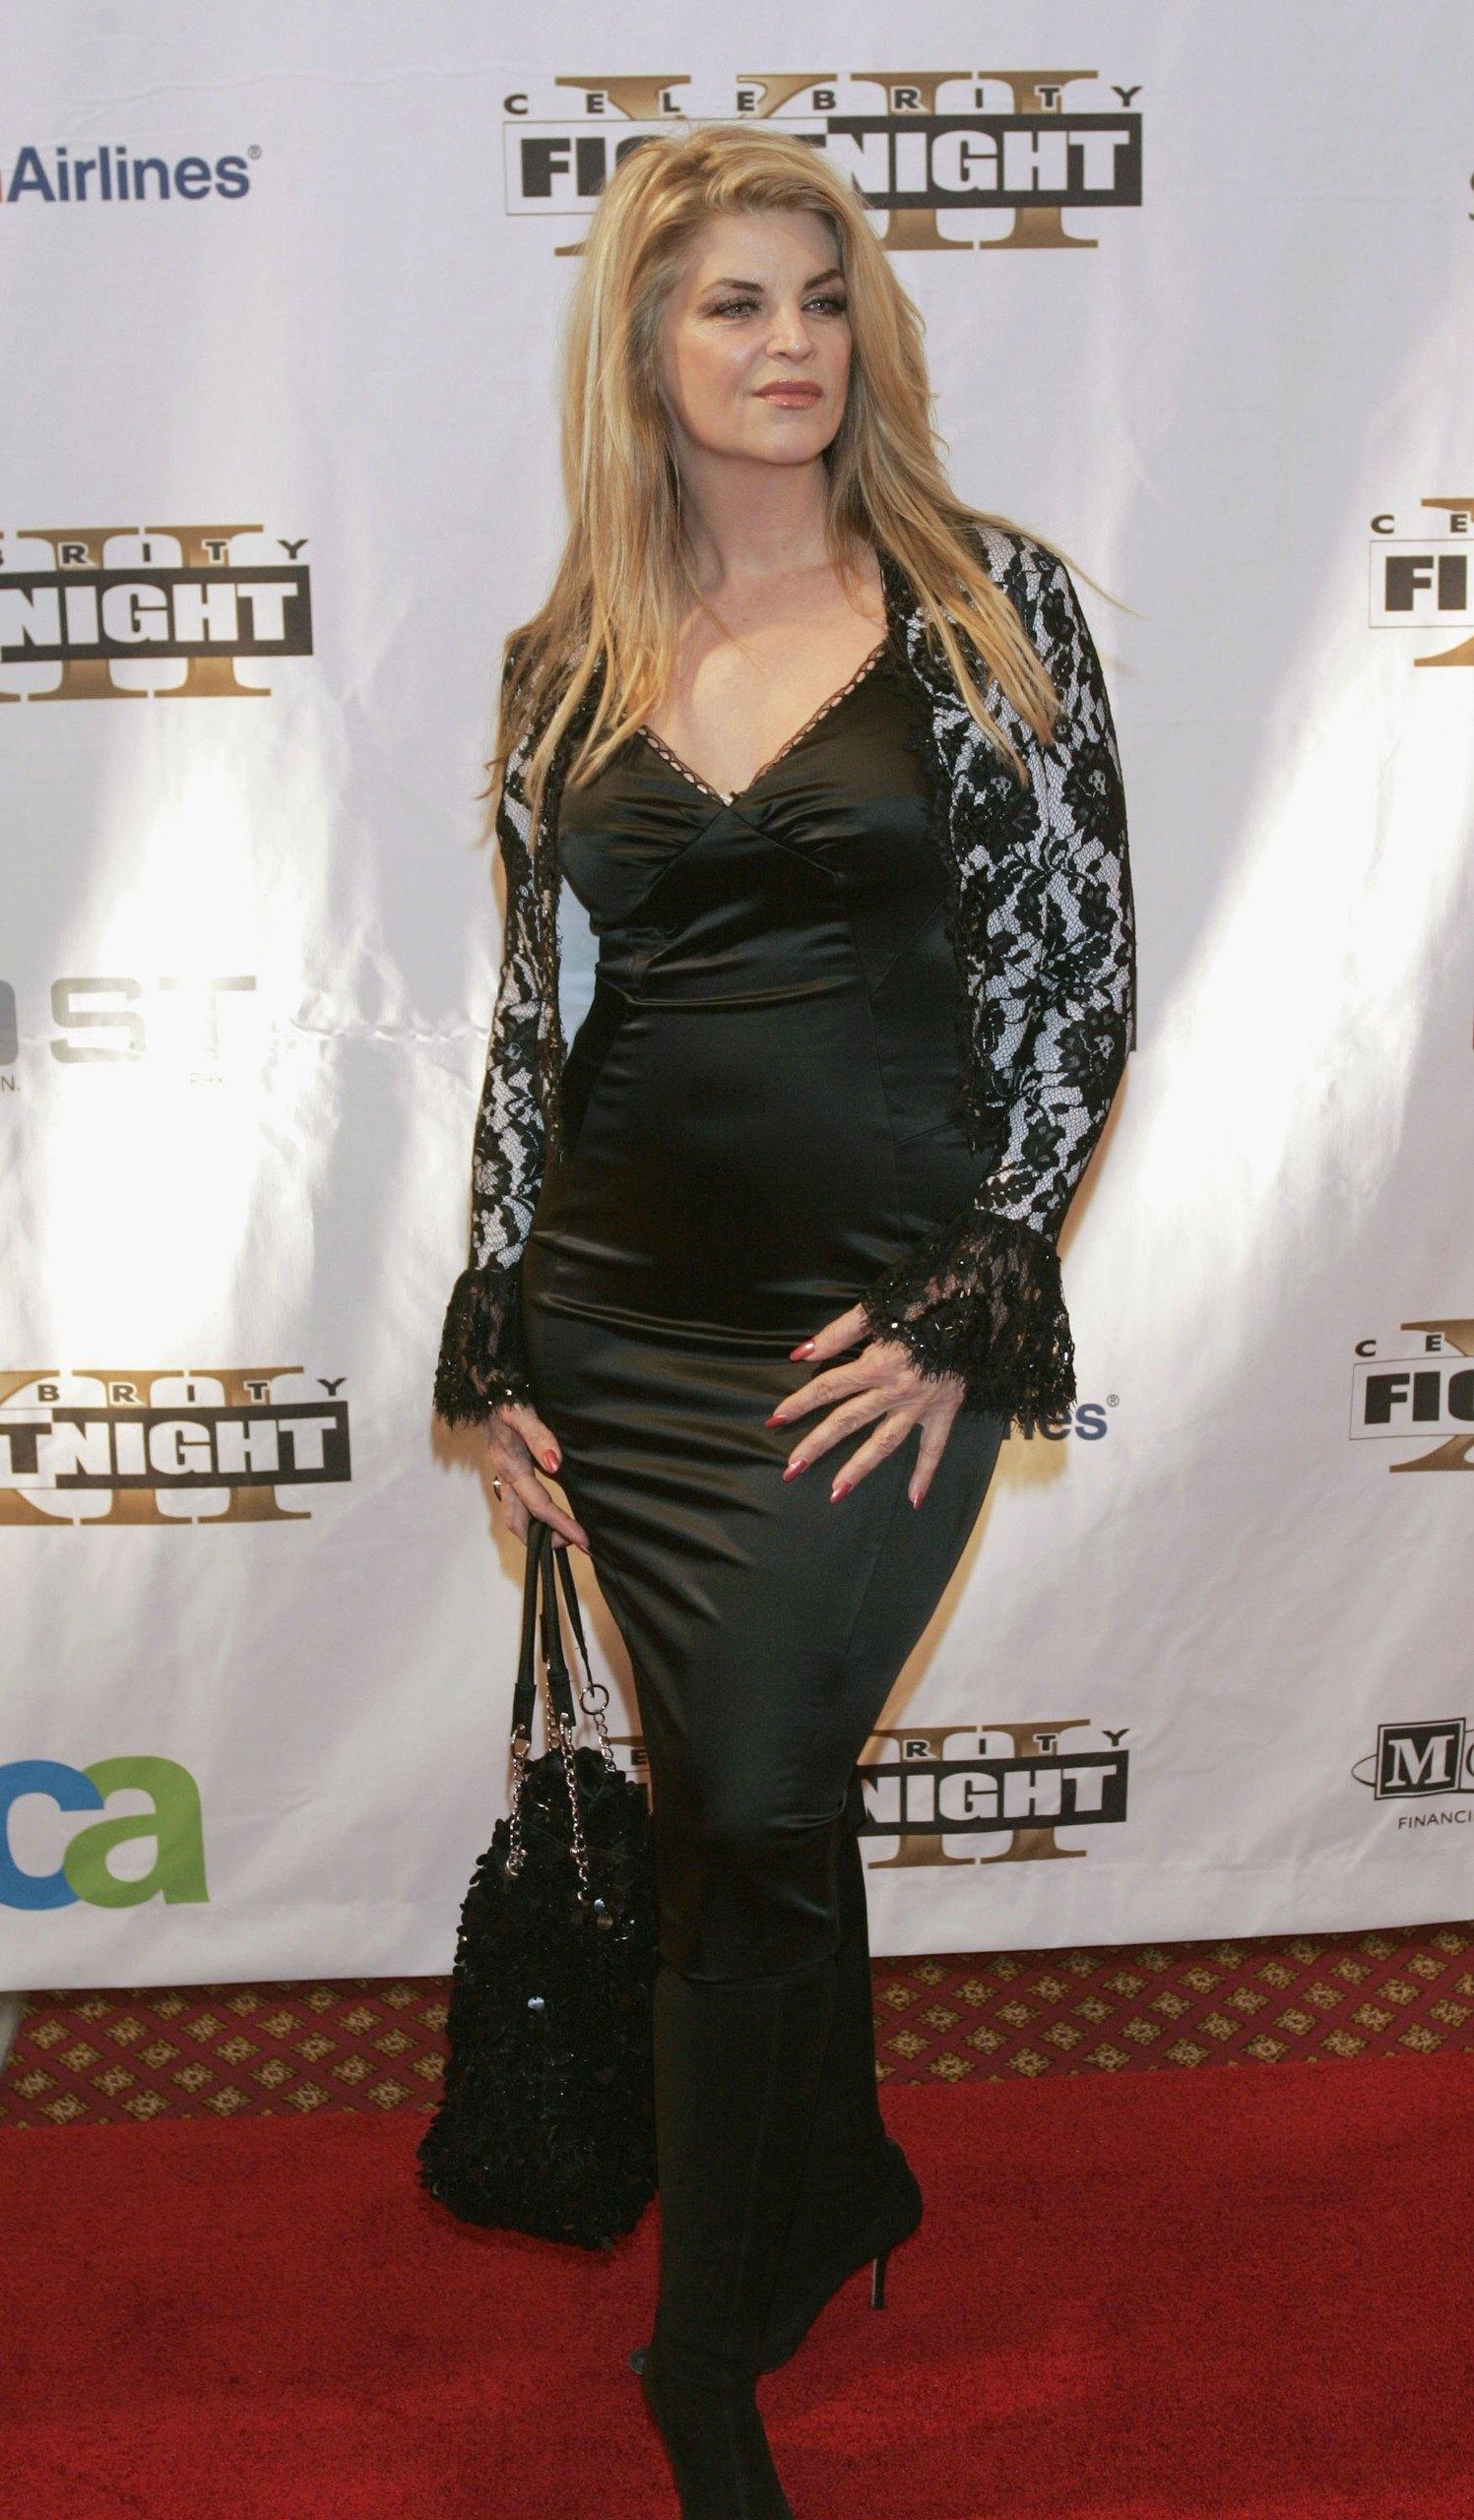 Kirstie Alley Celebrity Fight Night XII